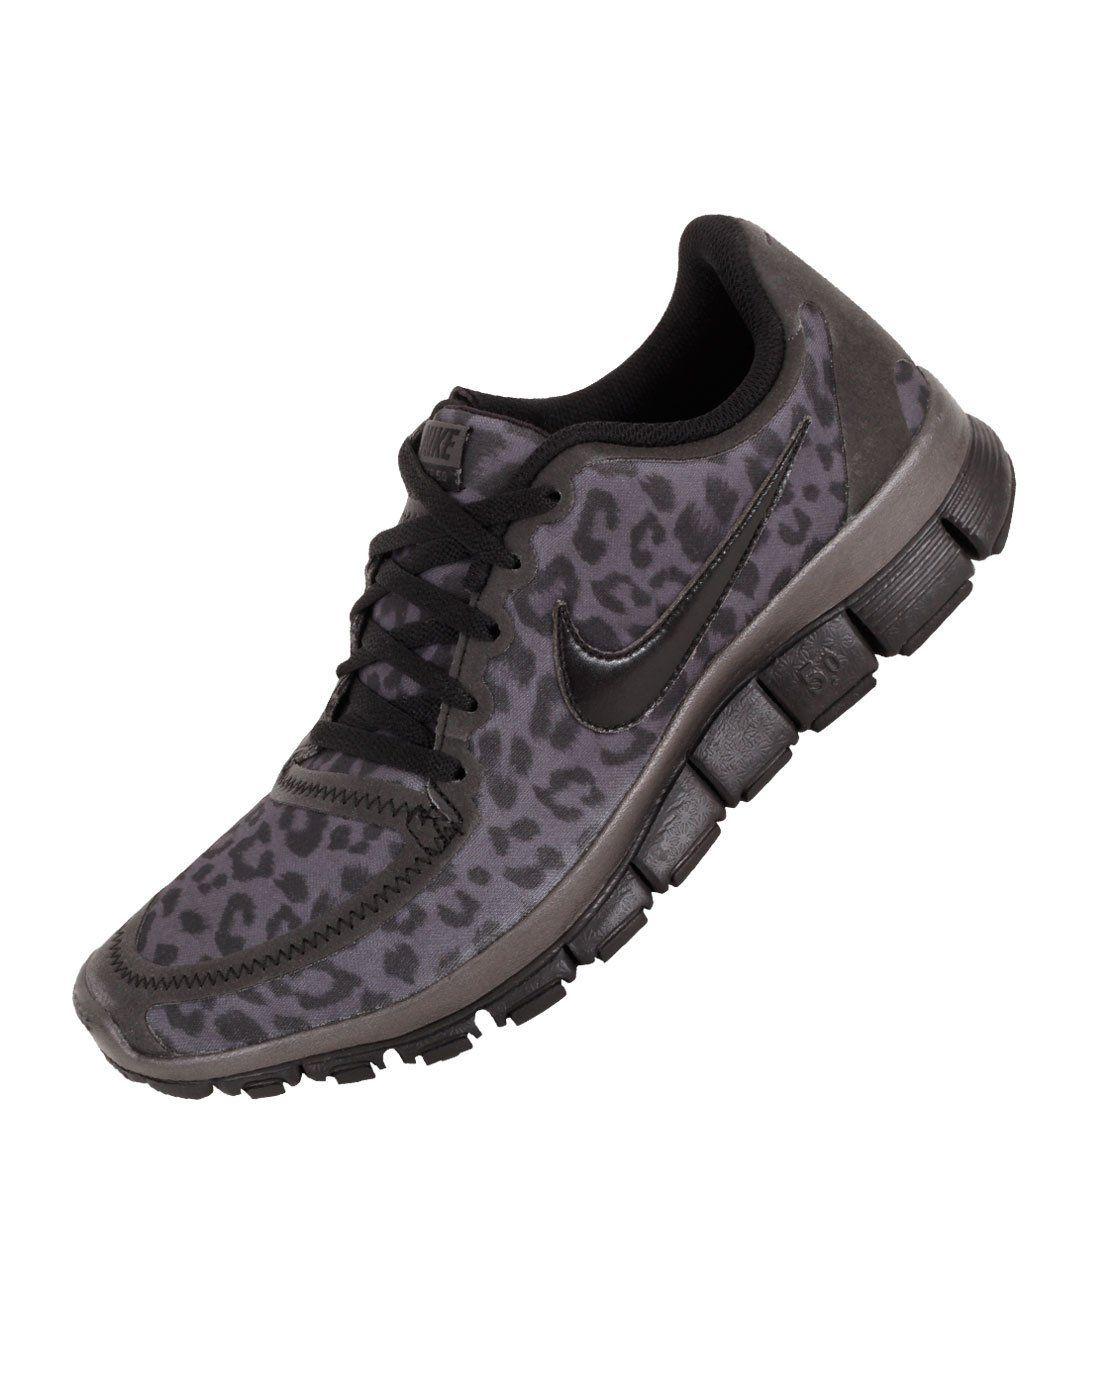 Nike Free Run 5.0 V4 Womens Running Shoes..x mas wish